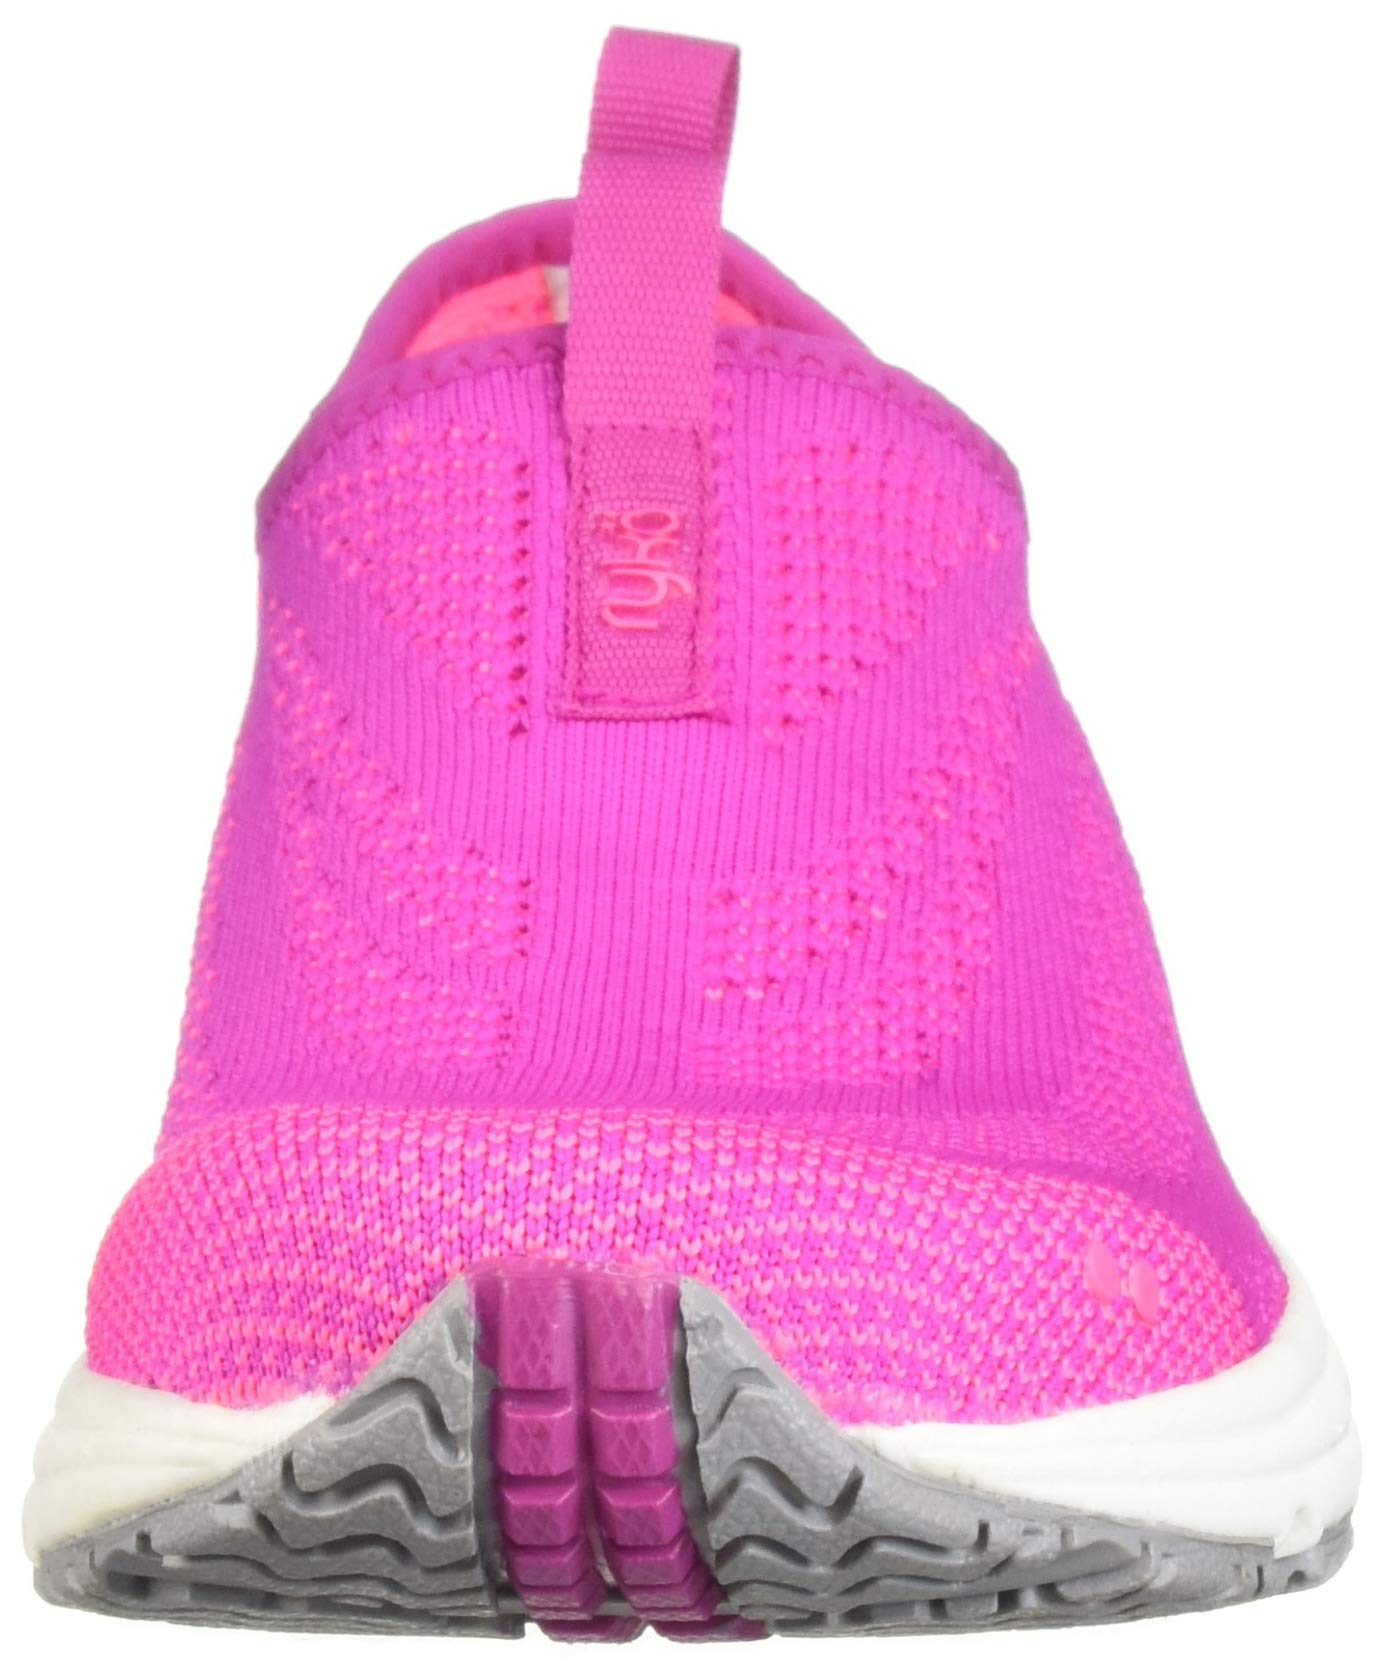 Ryka Women's Hydrosphere Cross Trainer, Bougainvilliea/Hyper Pink/Sconce Grey, 6.5 M US by Ryka (Image #4)